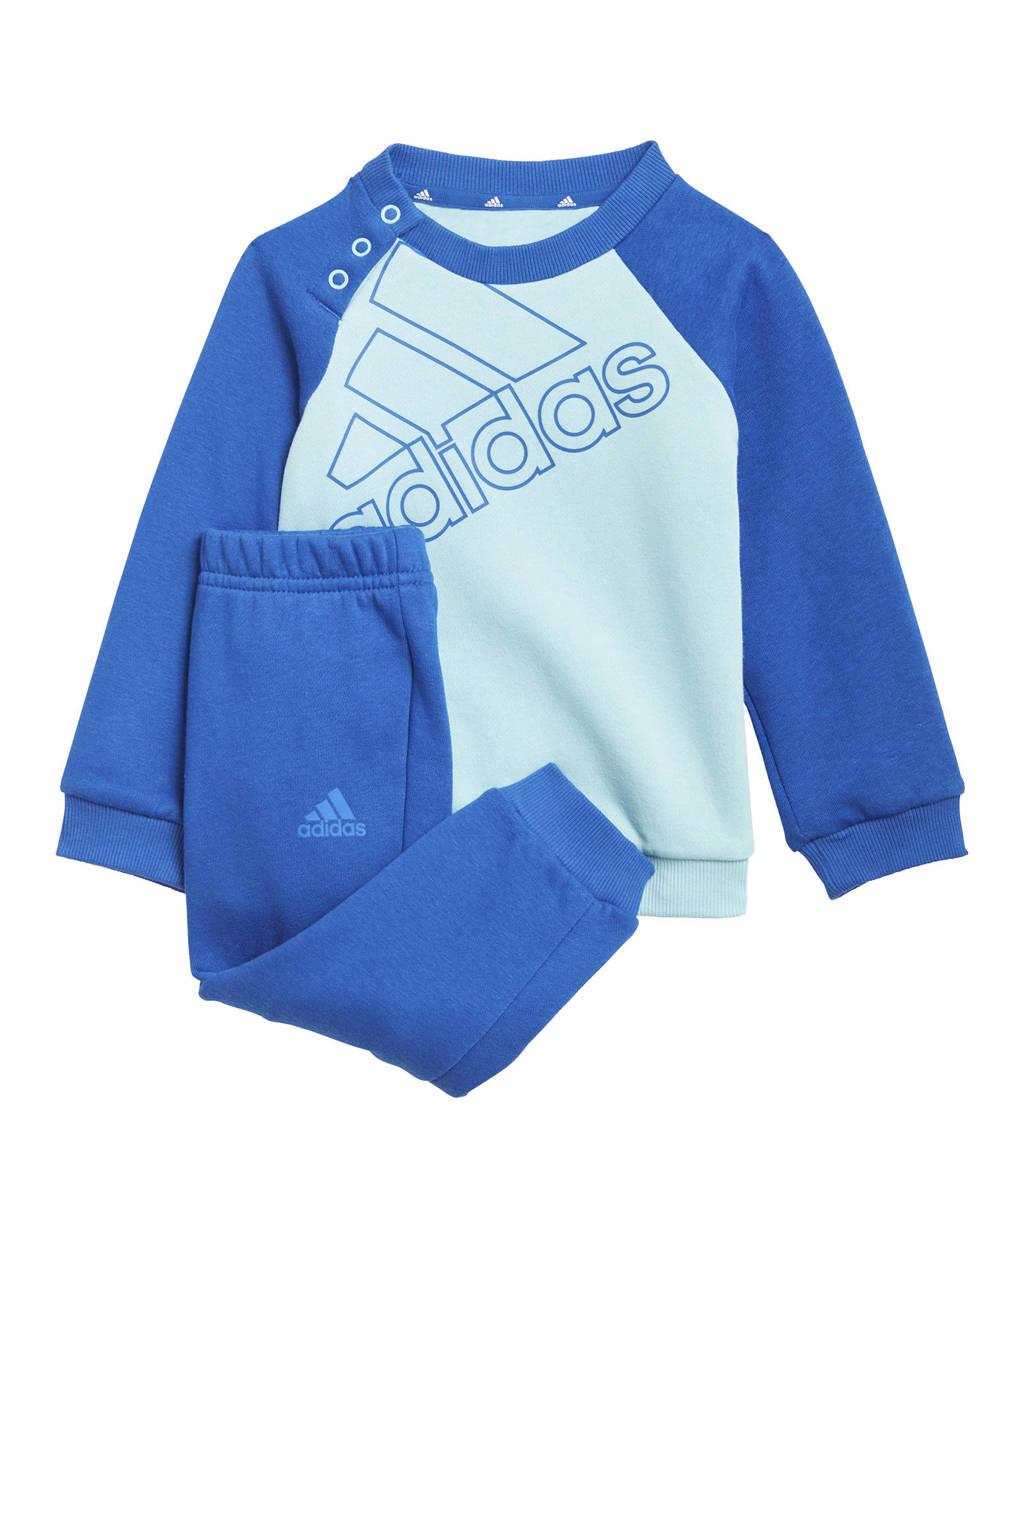 adidas Performance   joggingpak lichtblauw/blauw, Lichtblauw/blauw